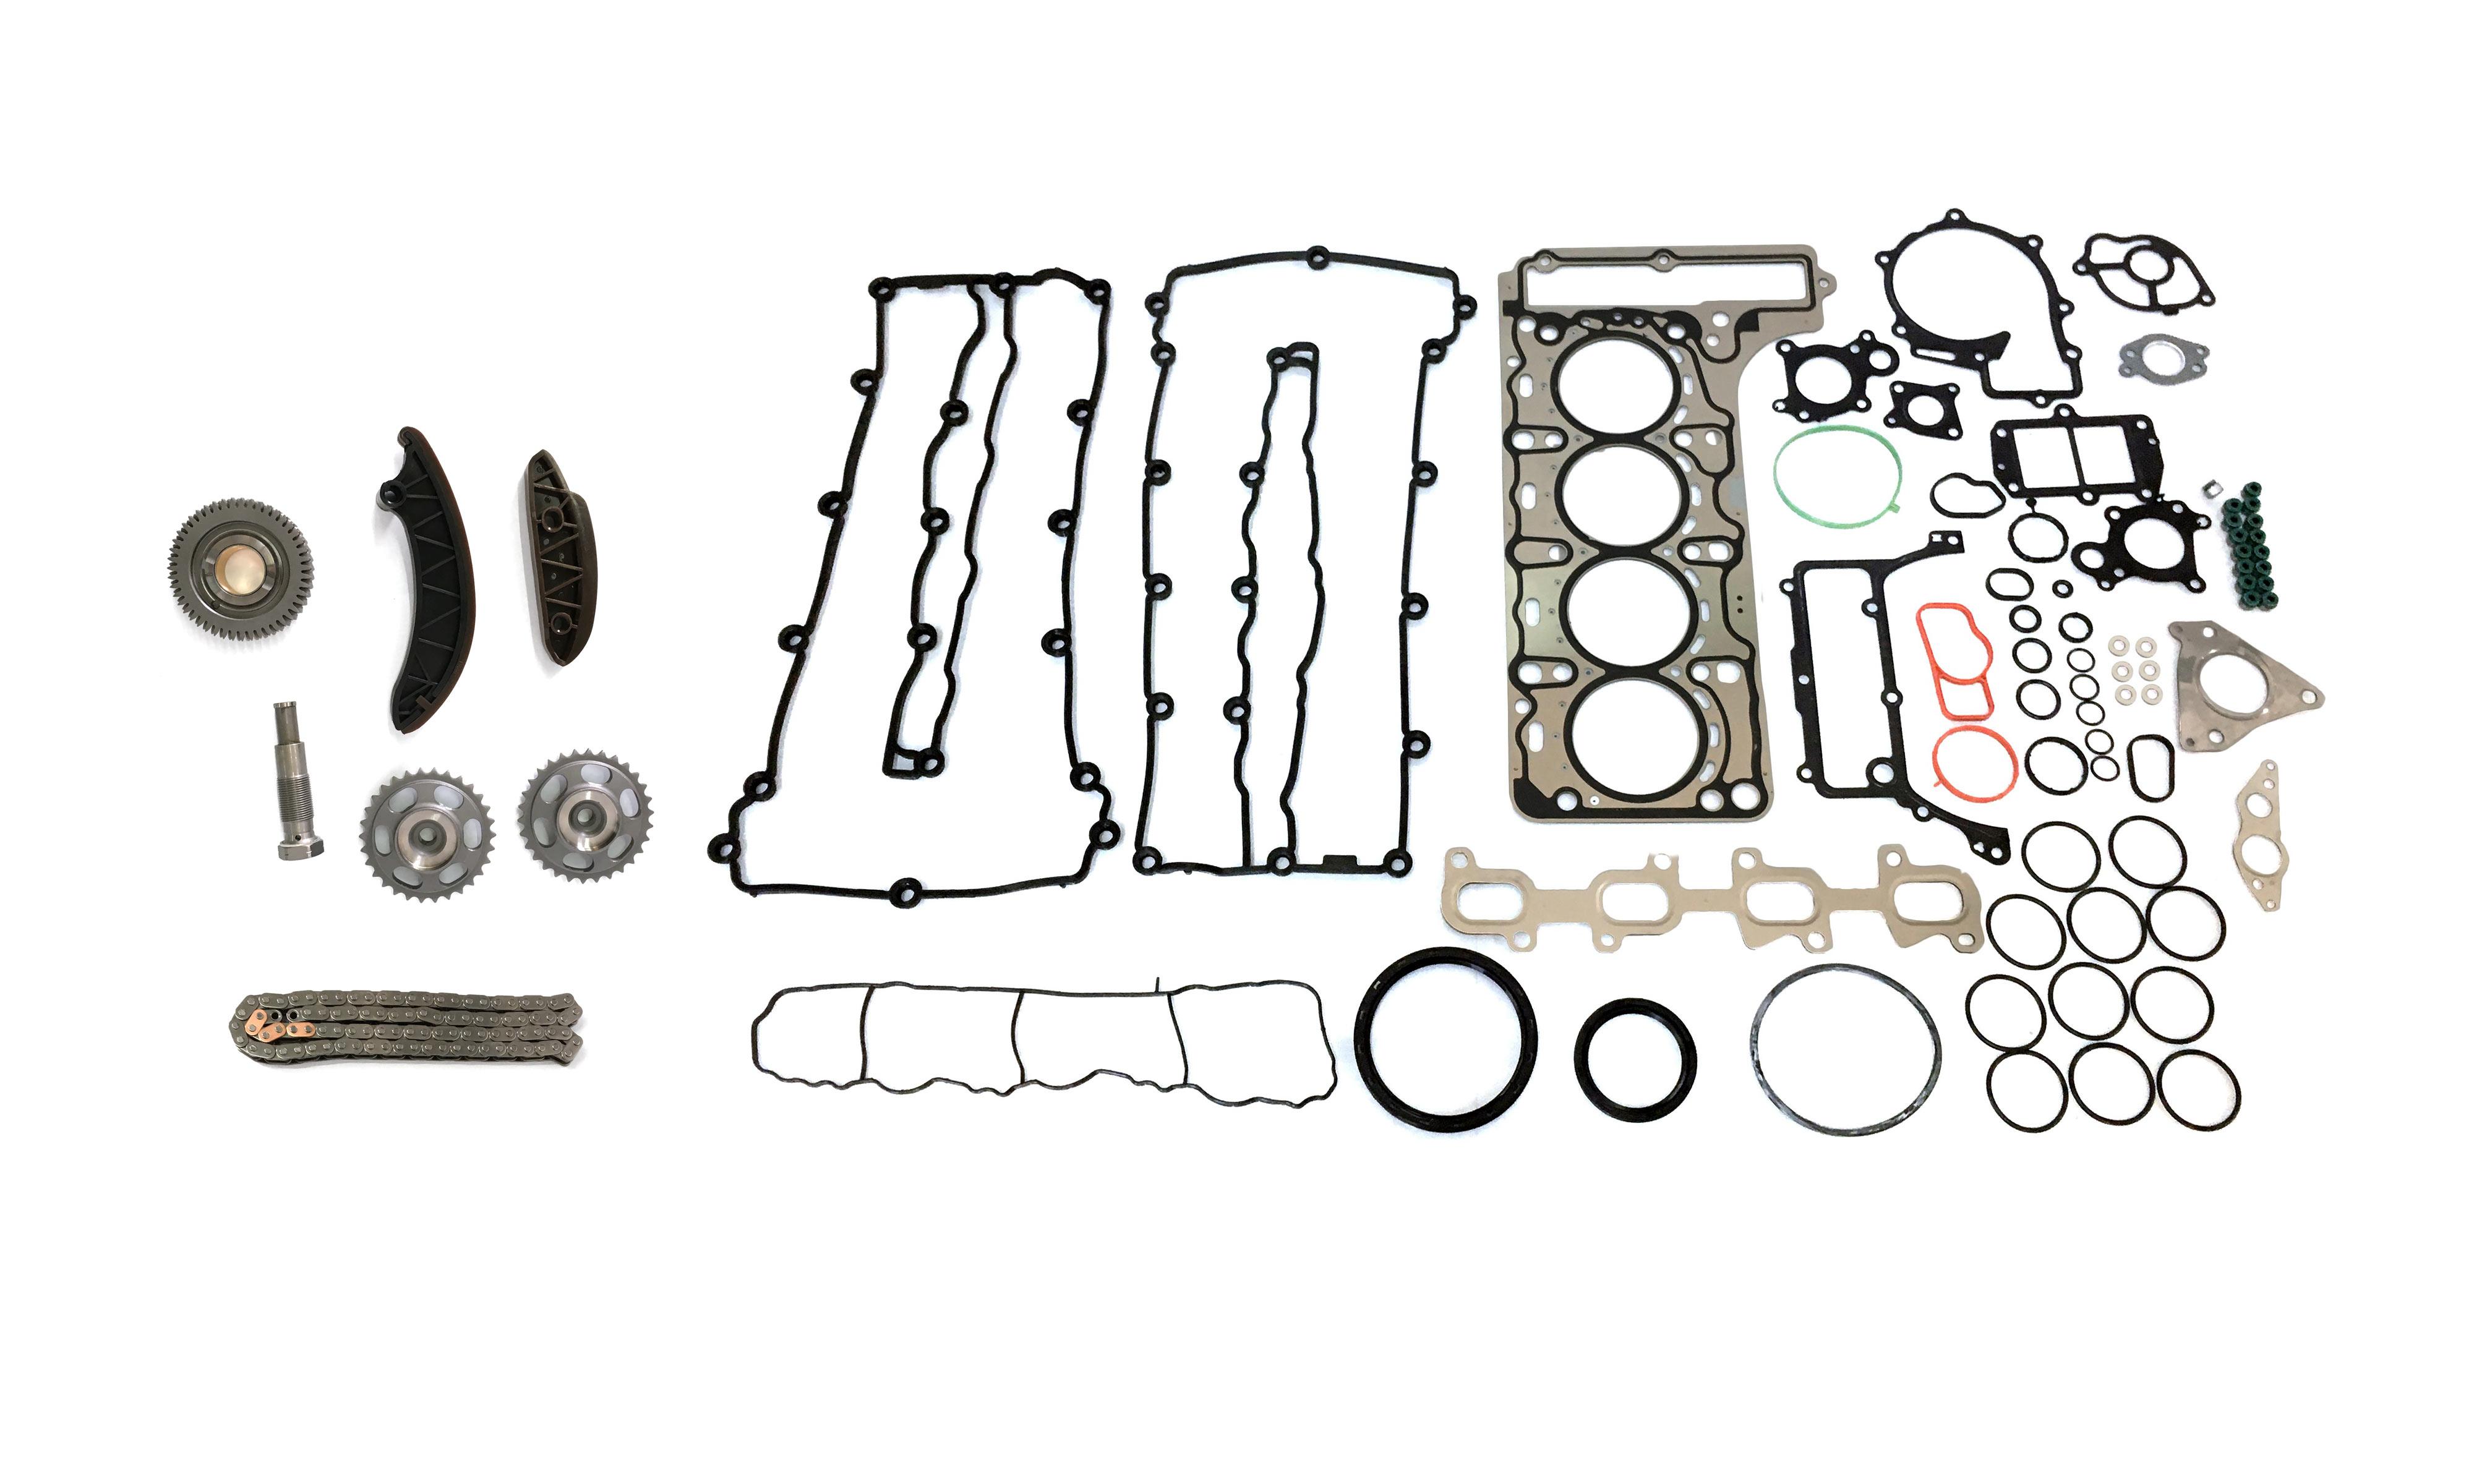 Steuerkettensatz Zylinderkopfdichtung Mercedes W205 C250 2,2 CDI 651.911 NEU